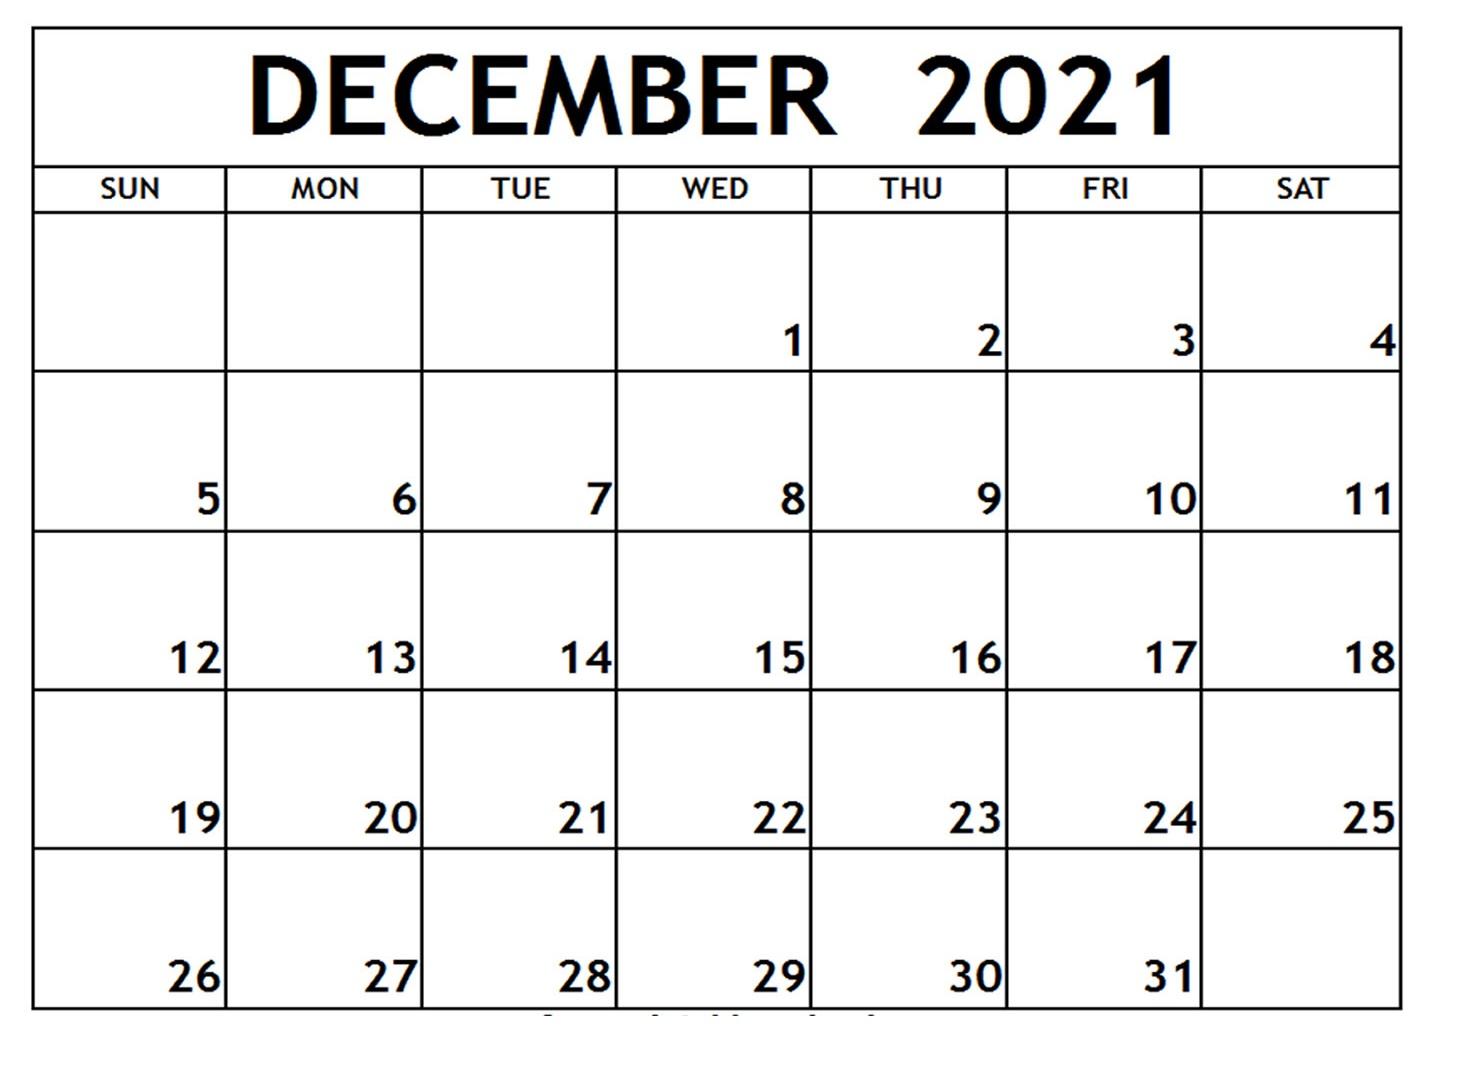 December 2021 Calendar Free